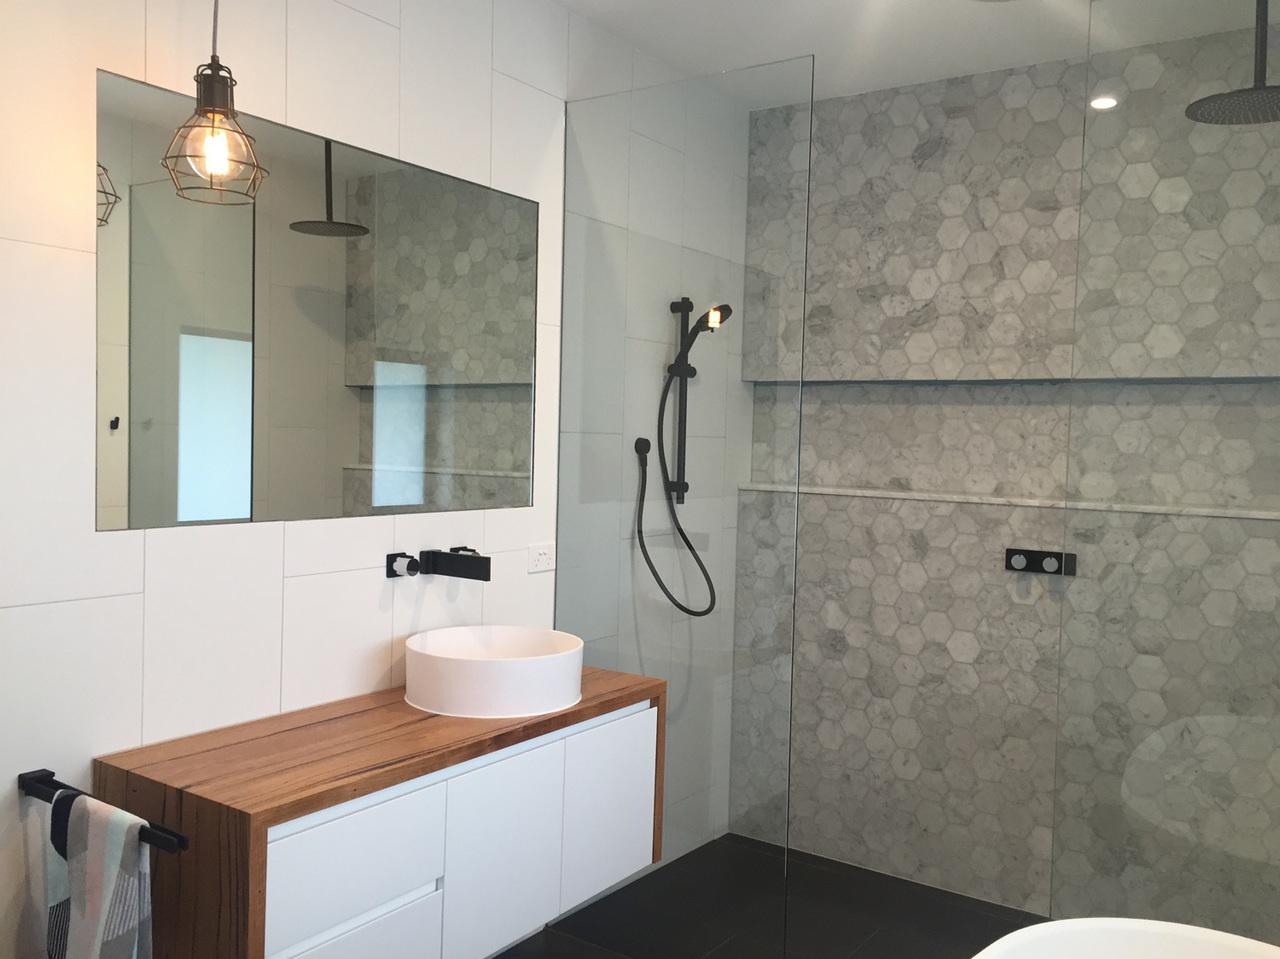 Custom Timber Bathroom Vanity Top By Retrograde Furniture